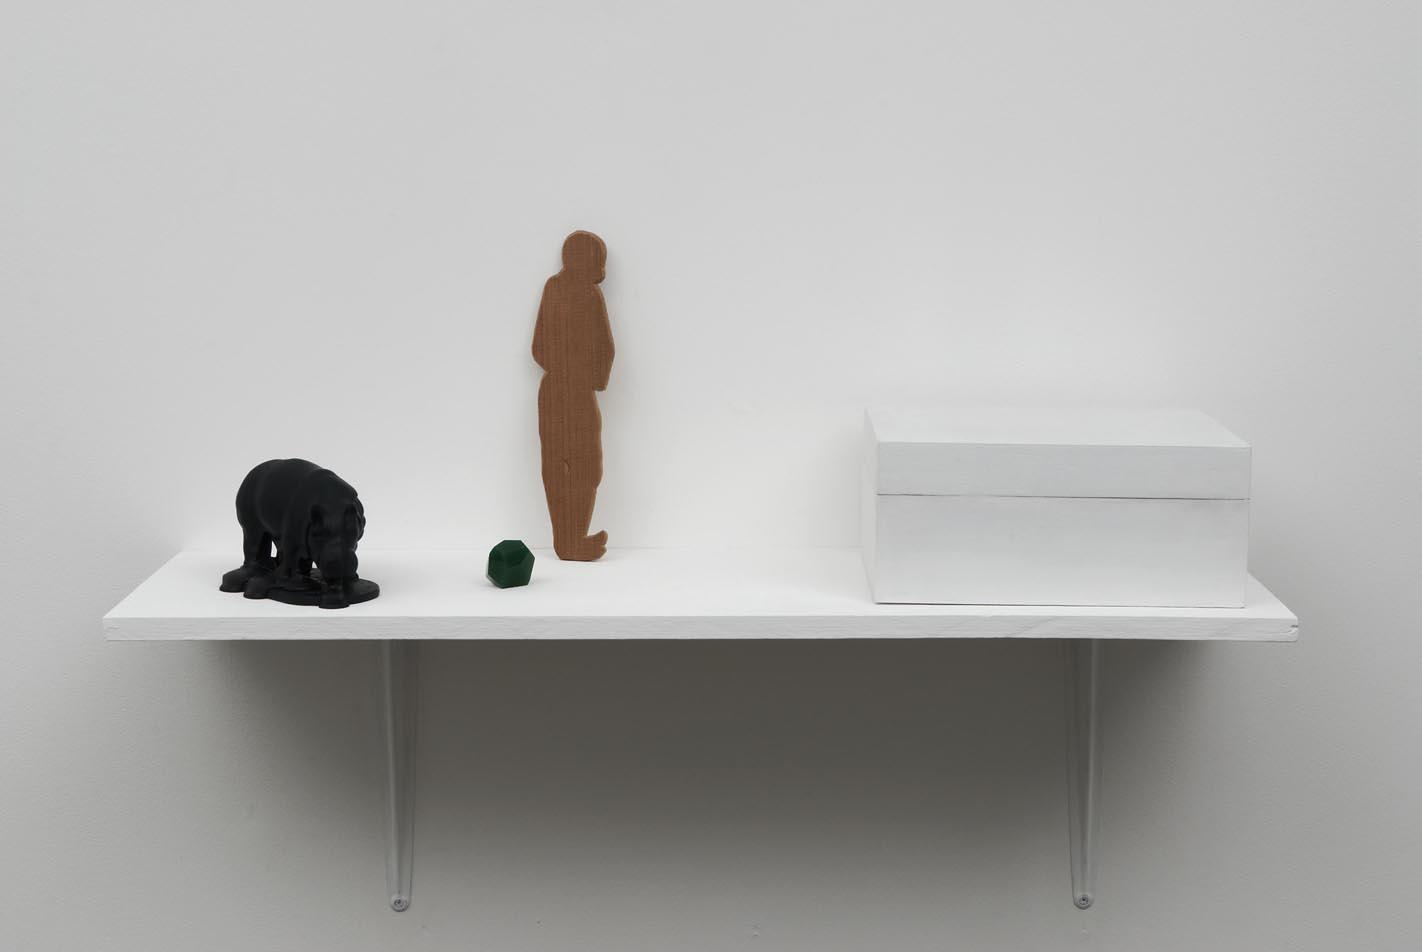 Christina Mackie Hippo Man Green Box 2009 Painted plywood, jesmonite, cedar, polyurethane, reconstituted foam 28 x 23 x 12.5 cm